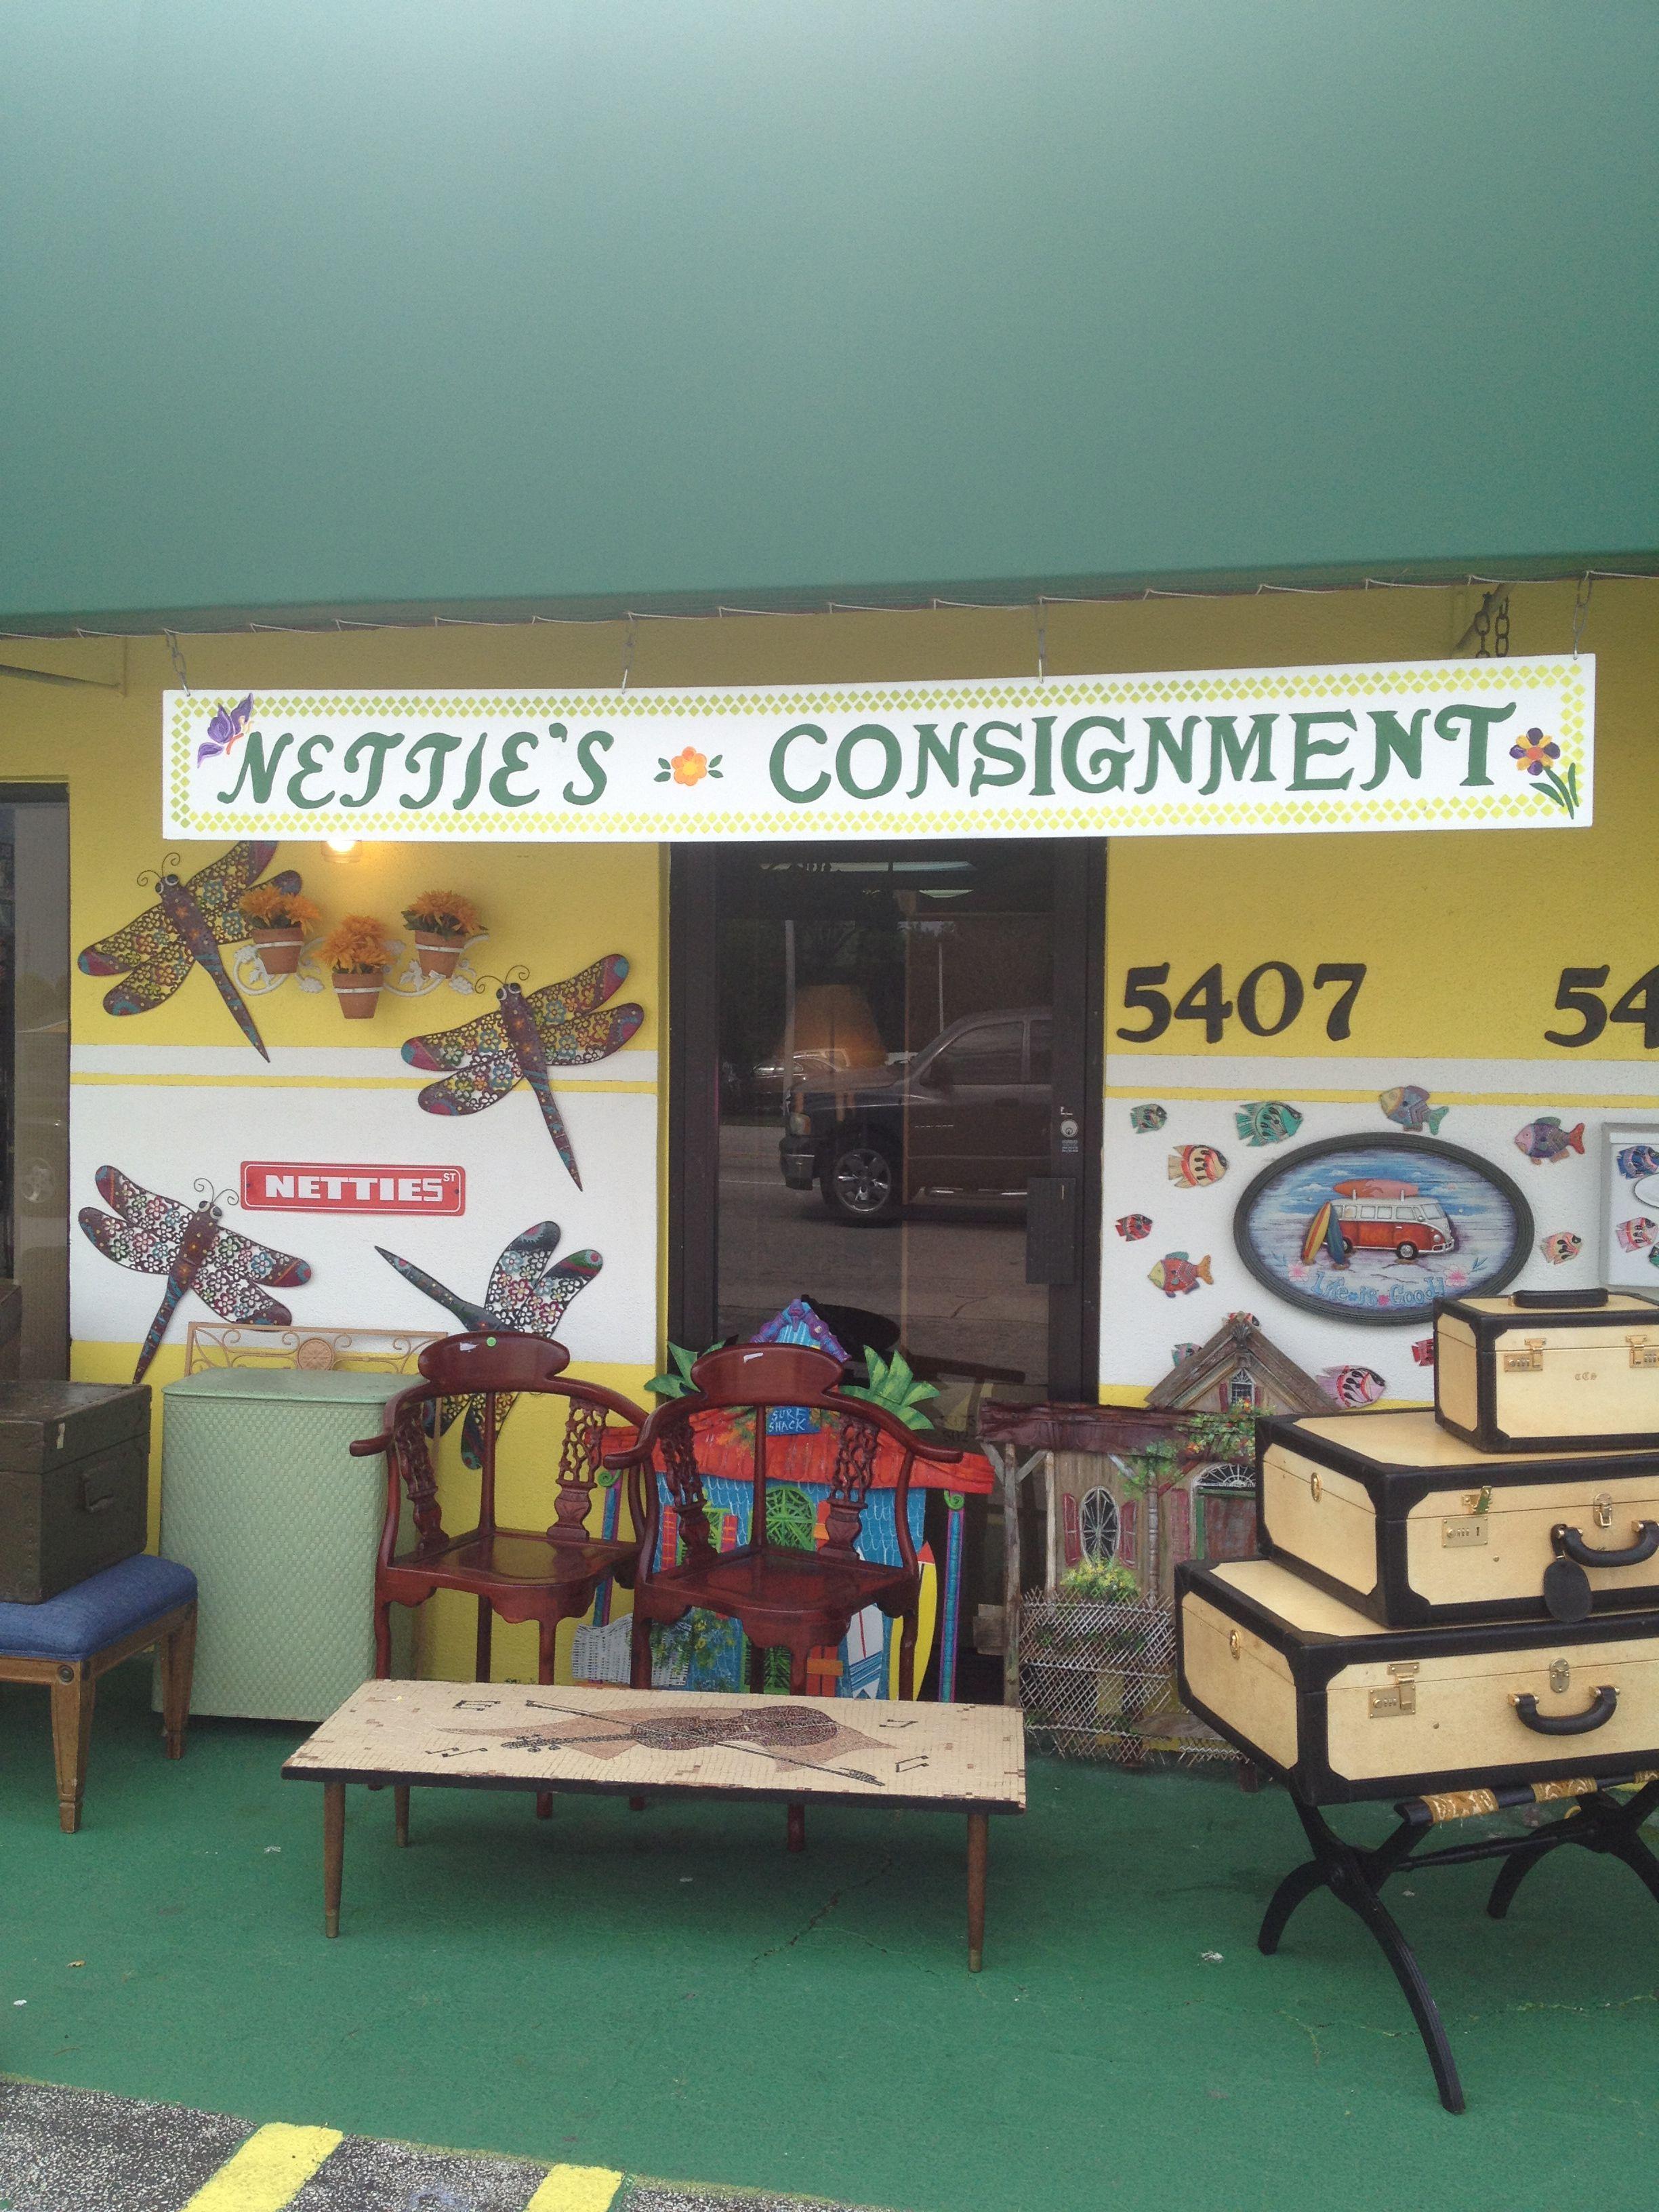 c356cfe01e32f484cf343335f8a97361 - Consignment Furniture Palm Beach Gardens Fl